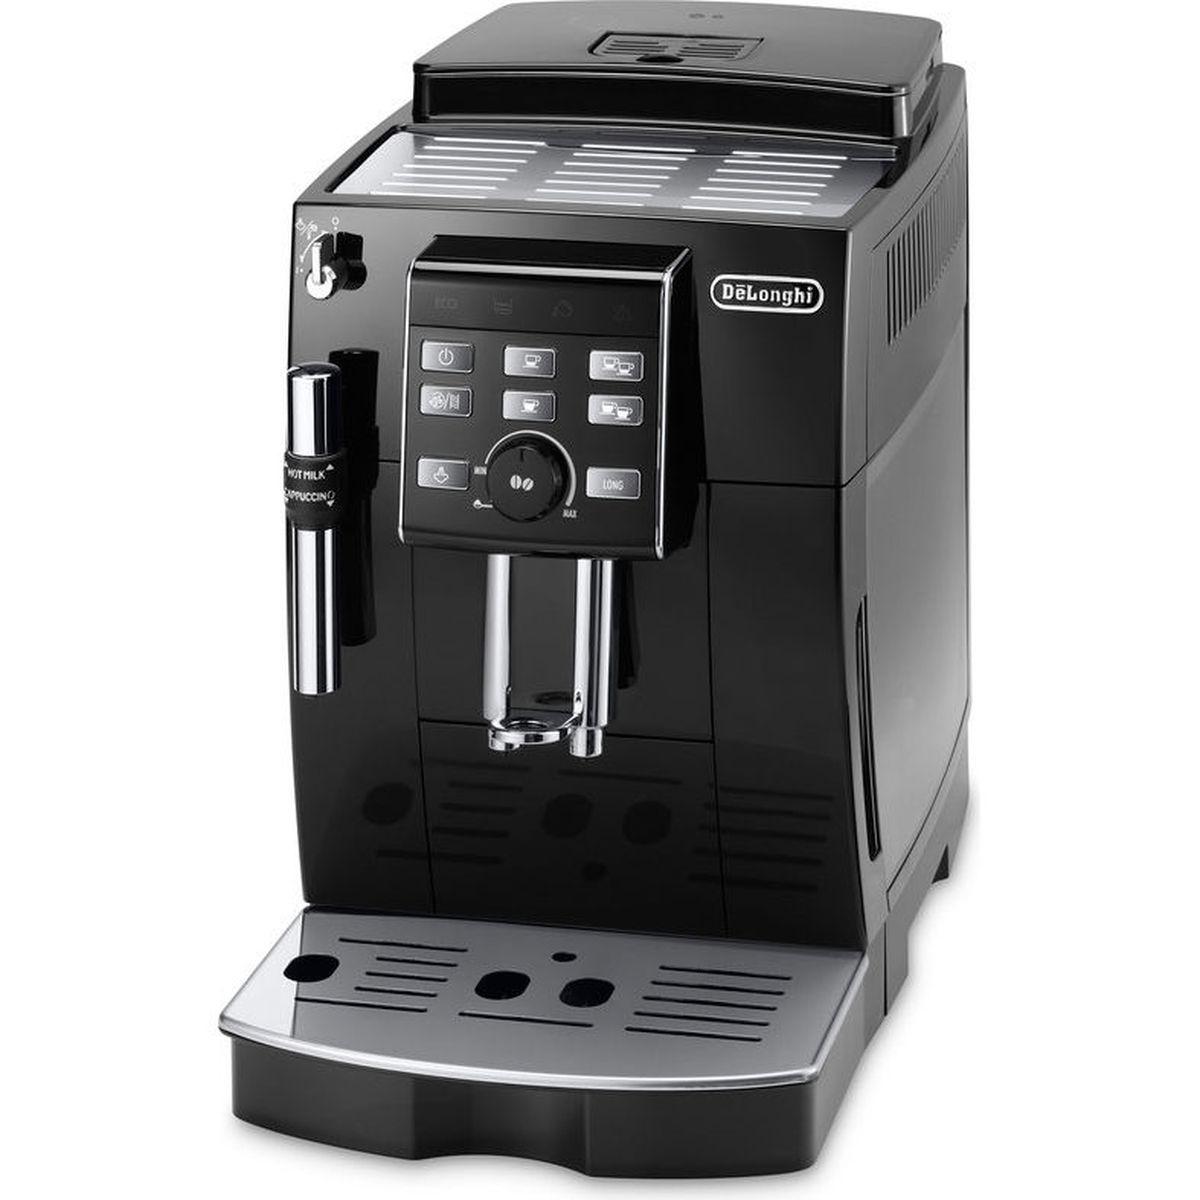 DeLonghi Kaffee-Vollautomat ECAM 25.128.B @ Karstadt